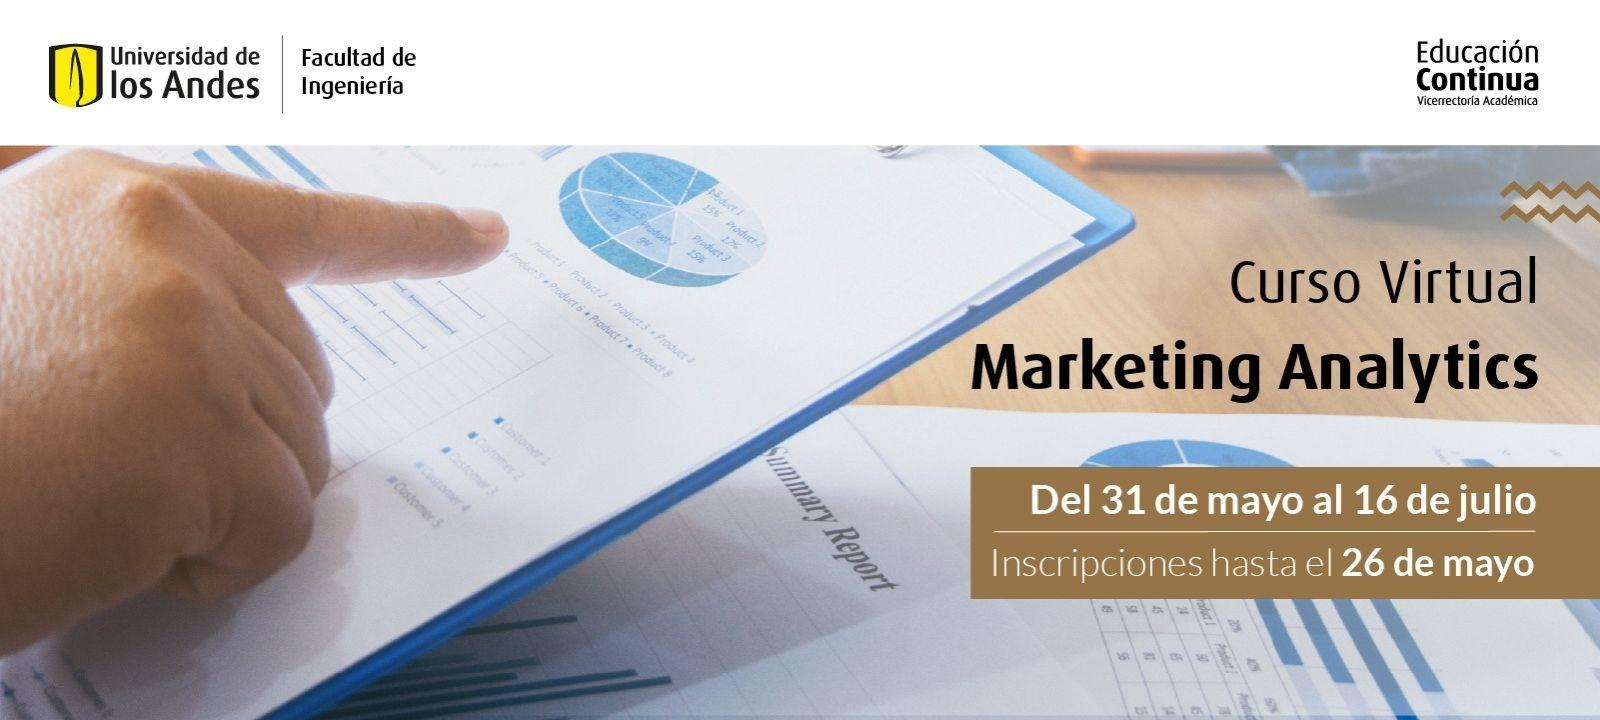 Curso virtual - Marketing Analytics